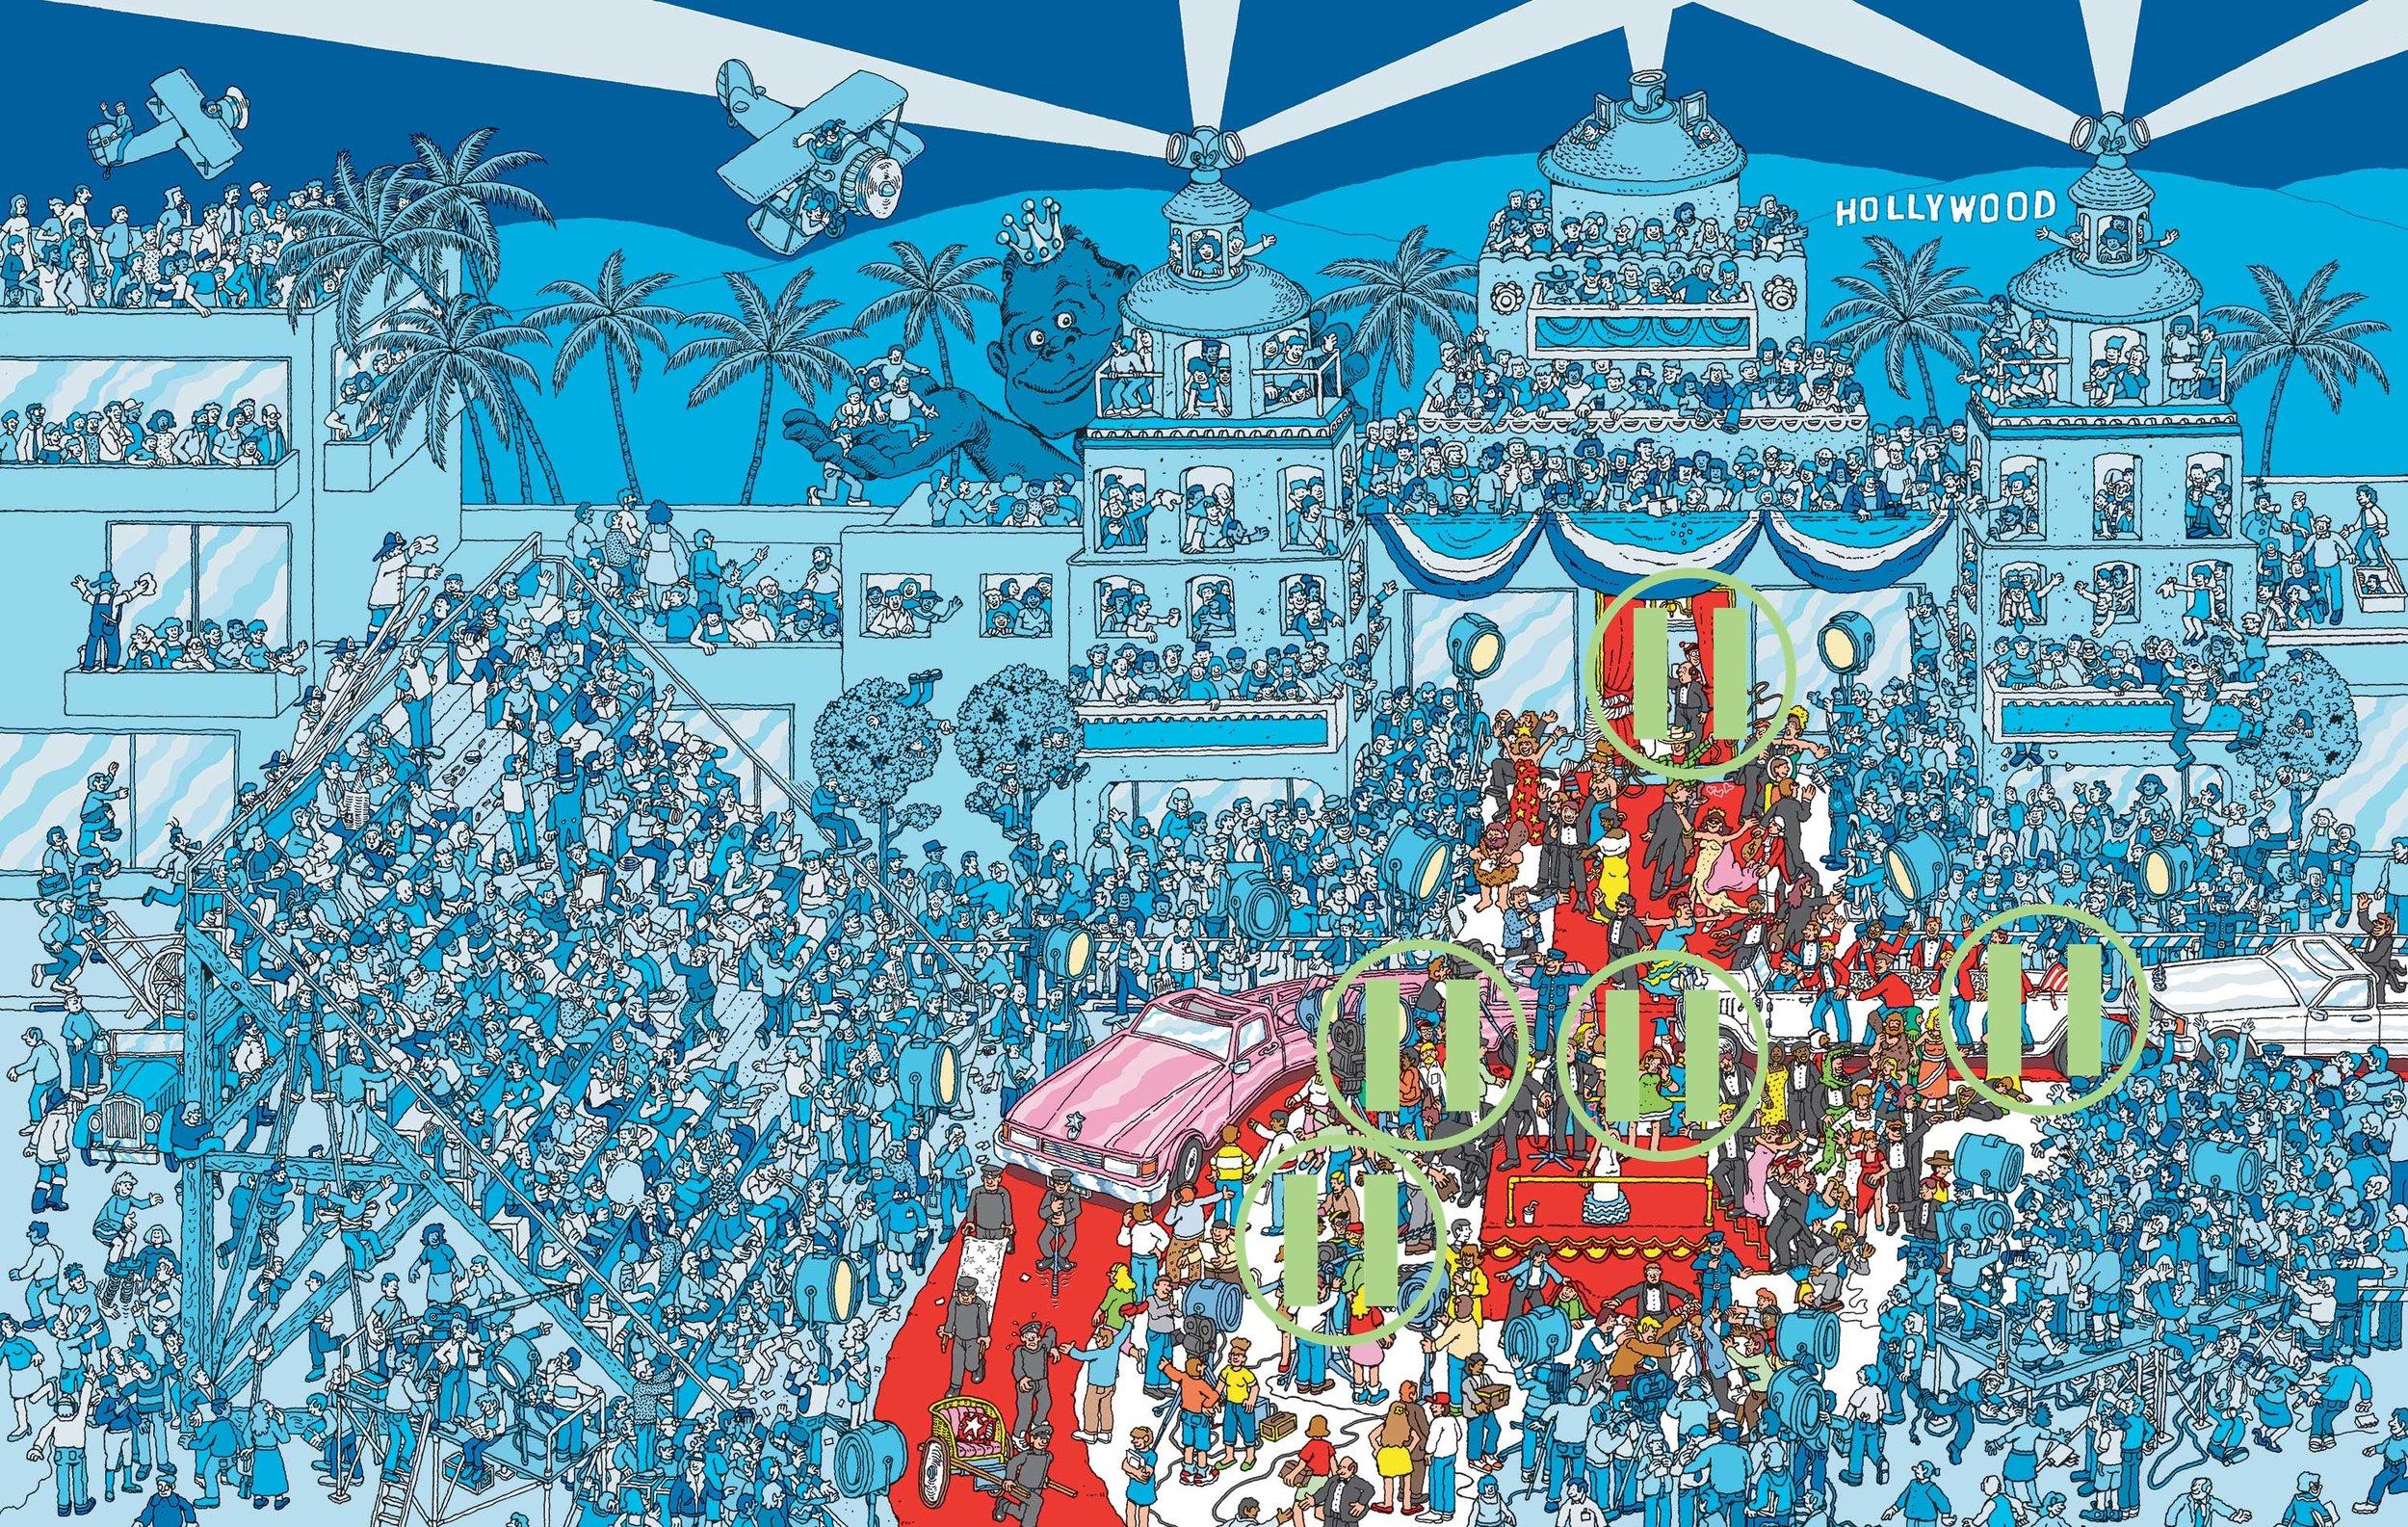 Where's Waldo - Hollywood, USA